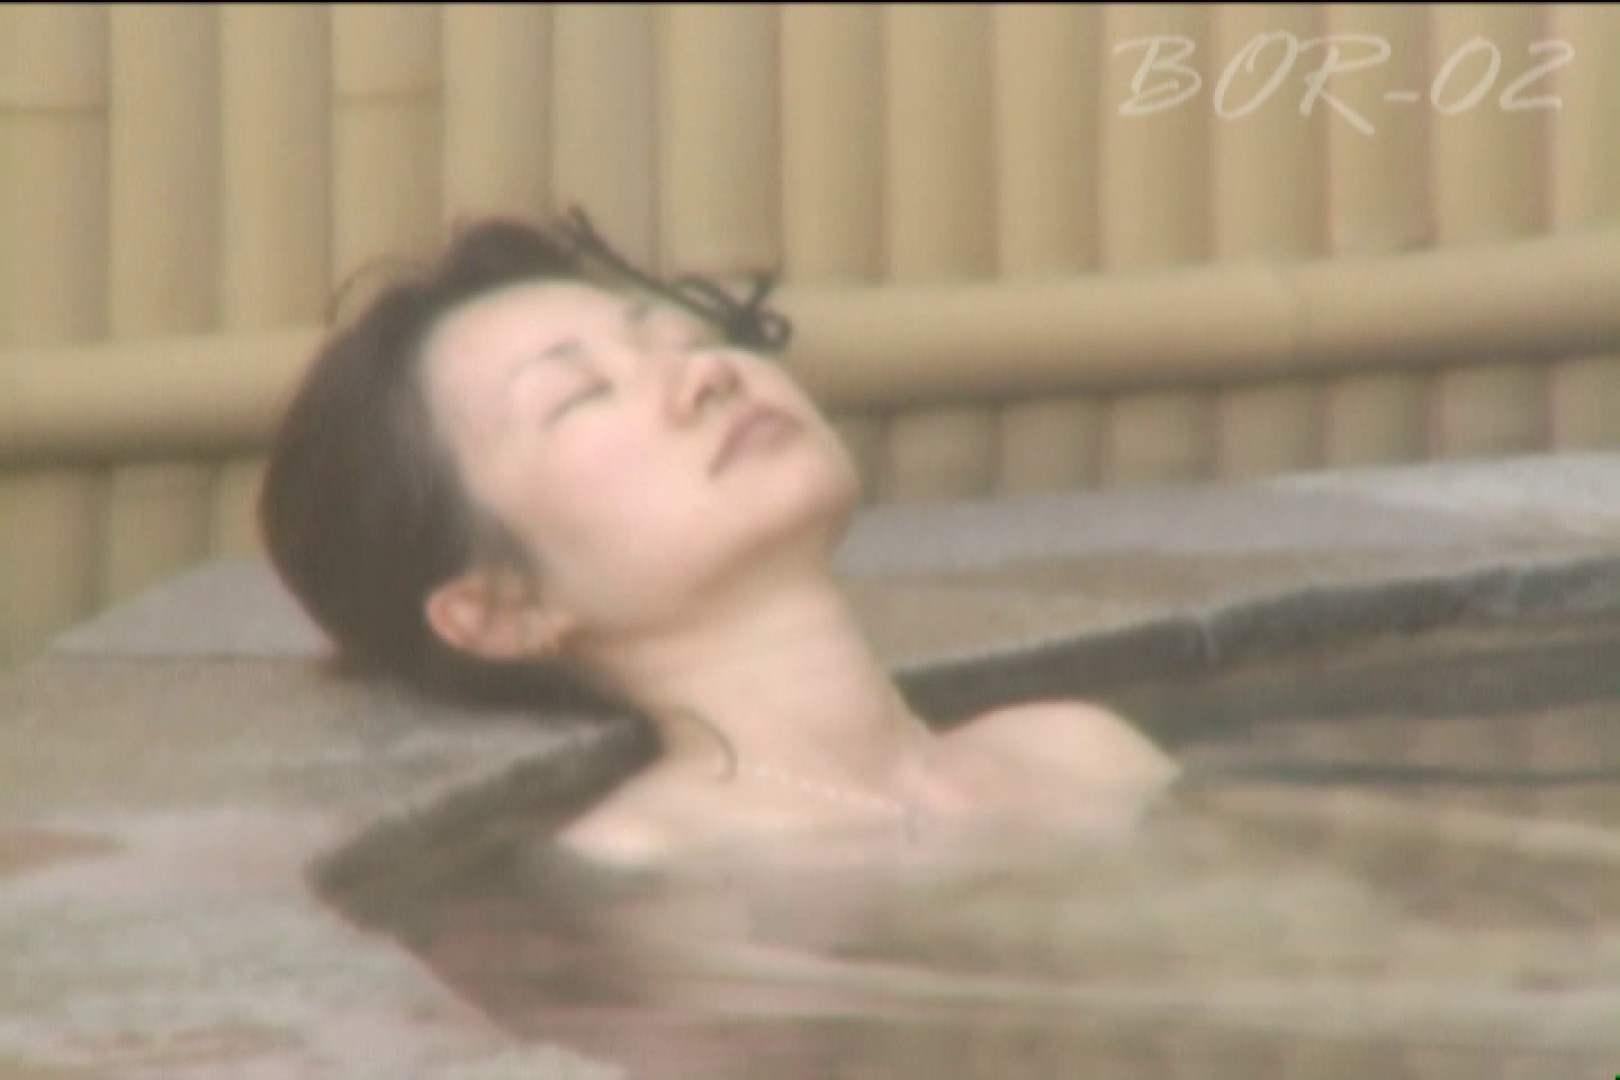 Aquaな露天風呂Vol.477 盗撮シリーズ | 露天風呂編  104PIX 59